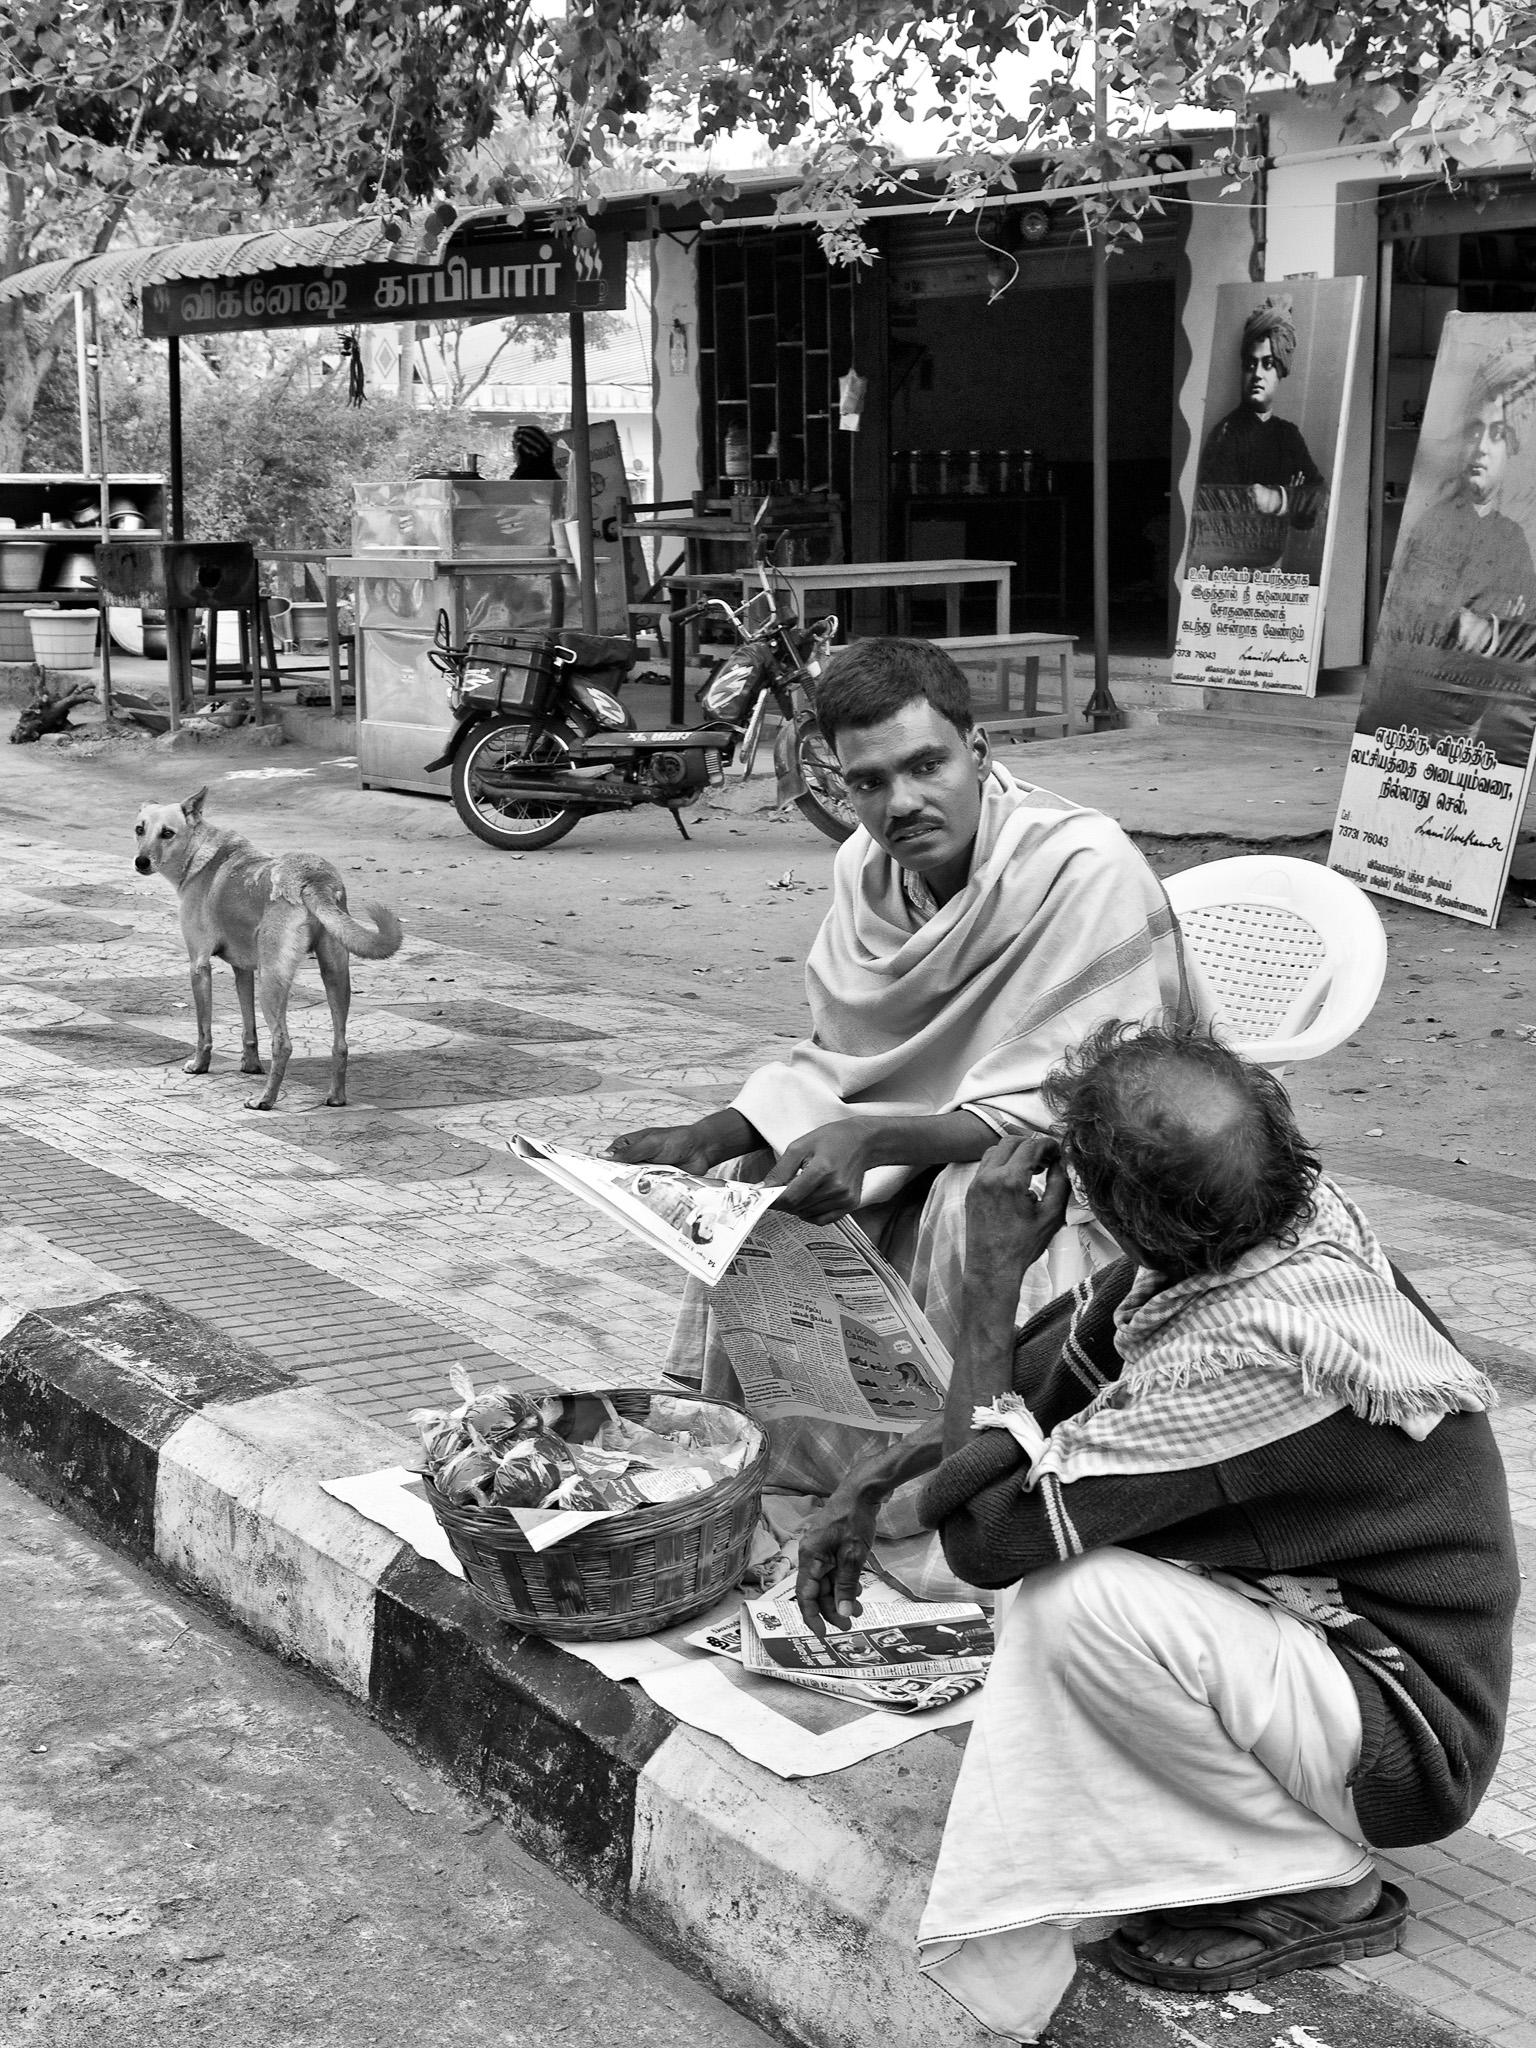 A street vendor, selling jaggery, in conversation, Tiruvannamalai, Tamil Nadu, India